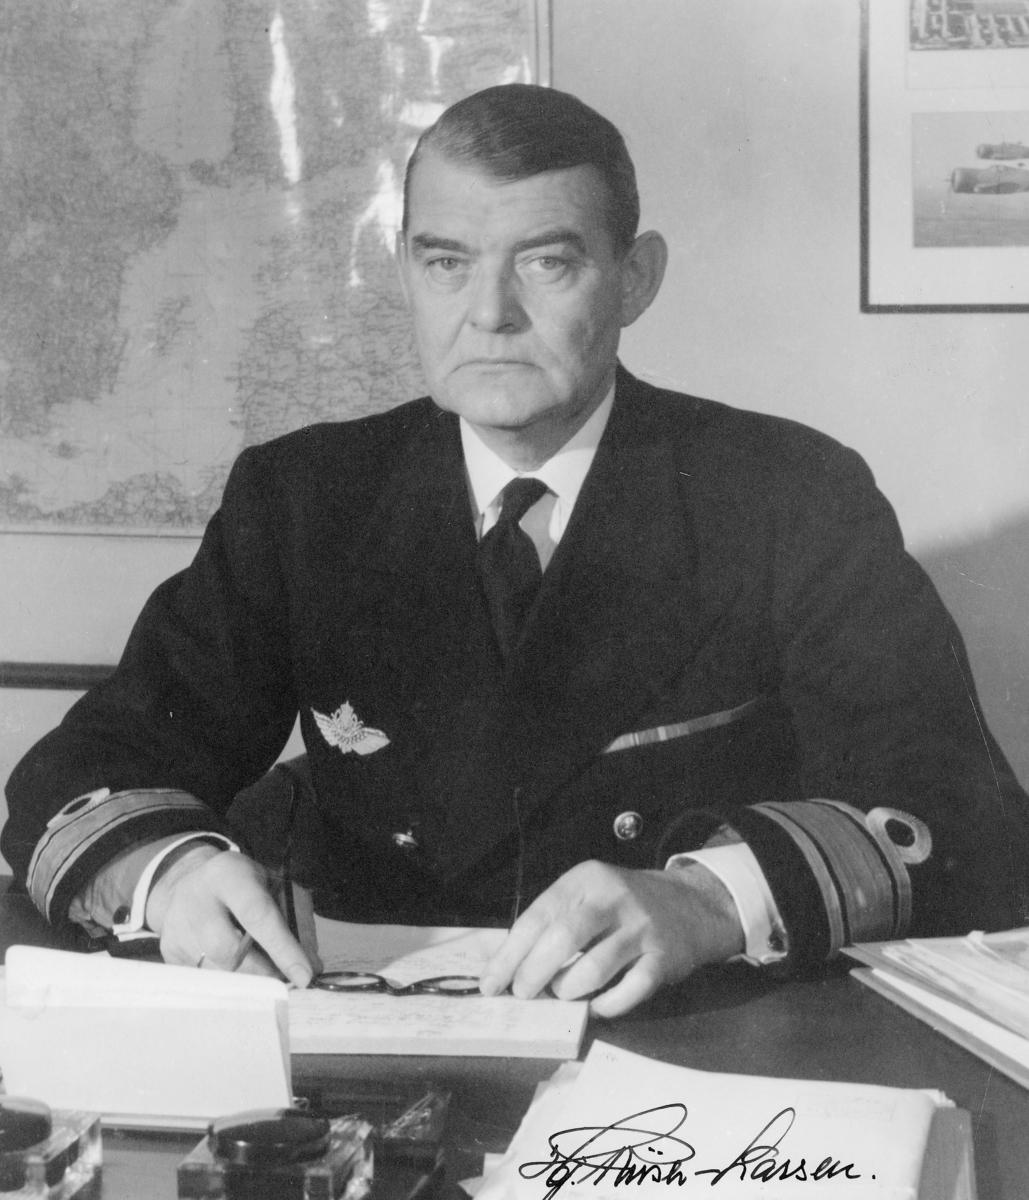 generalmajor, Hjalmar Riiser-Larsen, luftfart